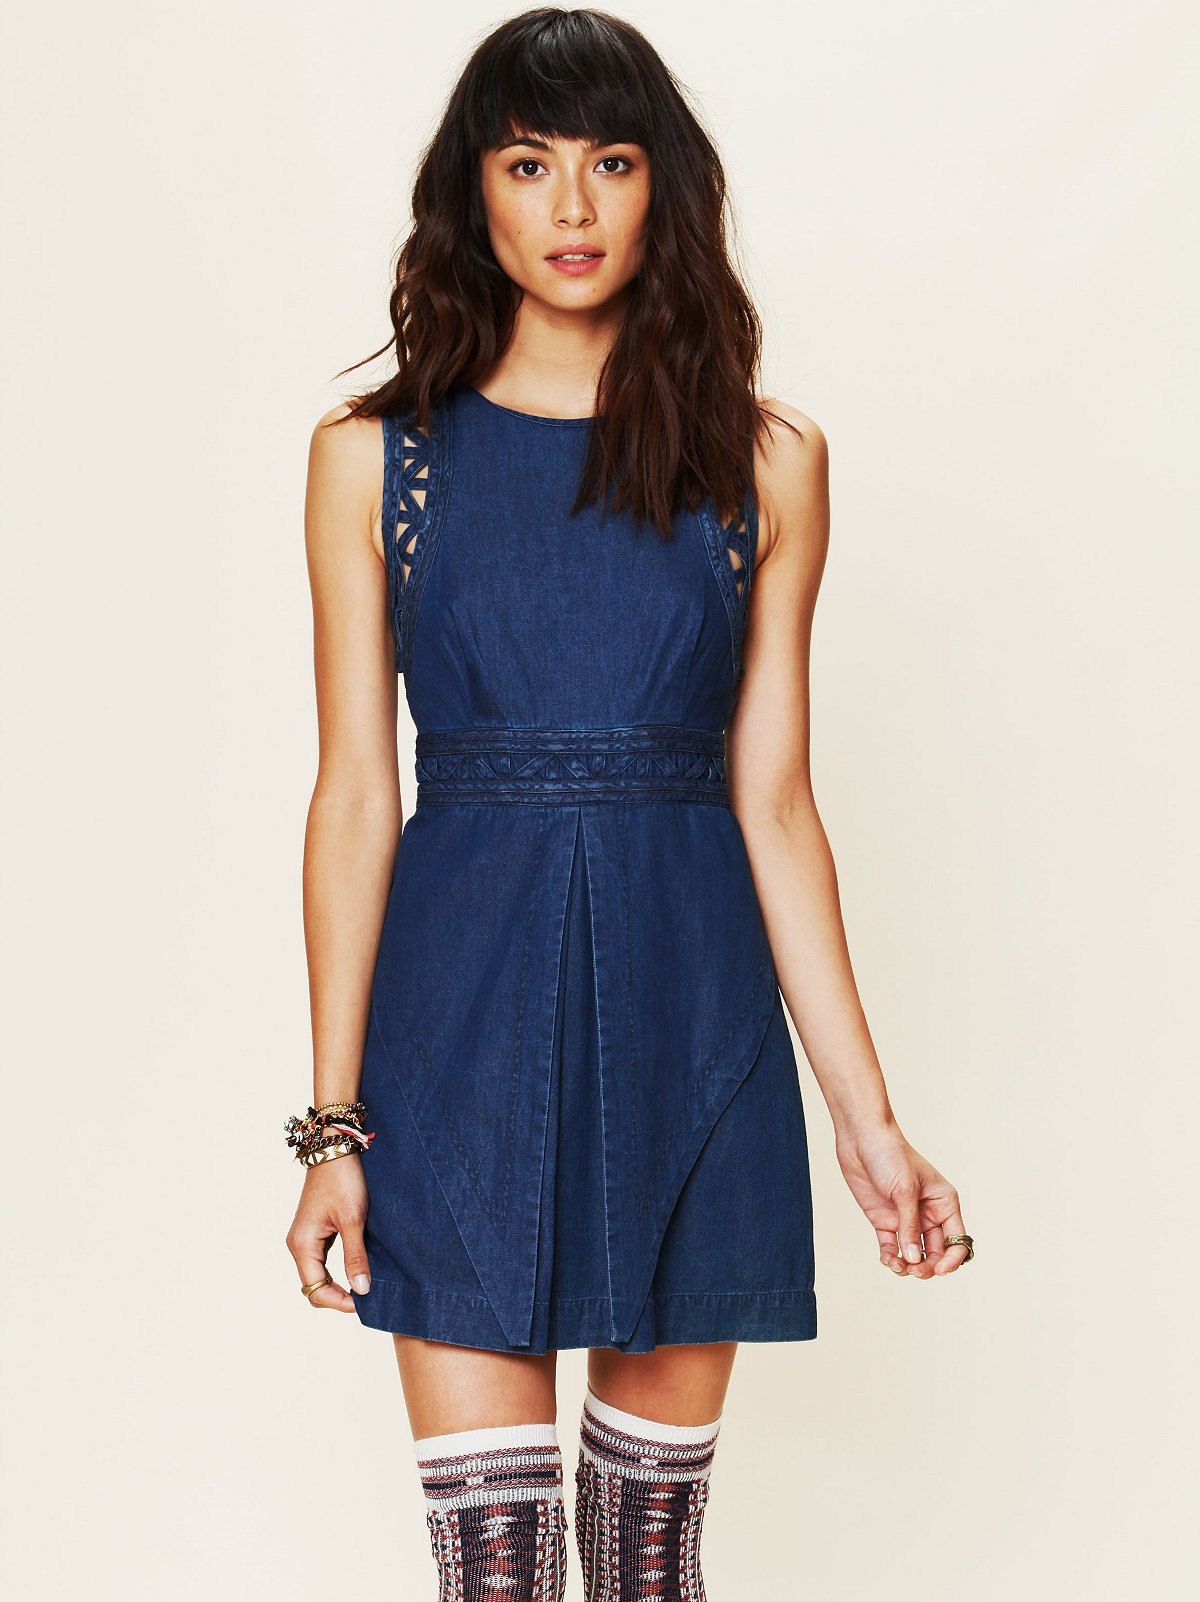 FP New Romantics Denim Dress